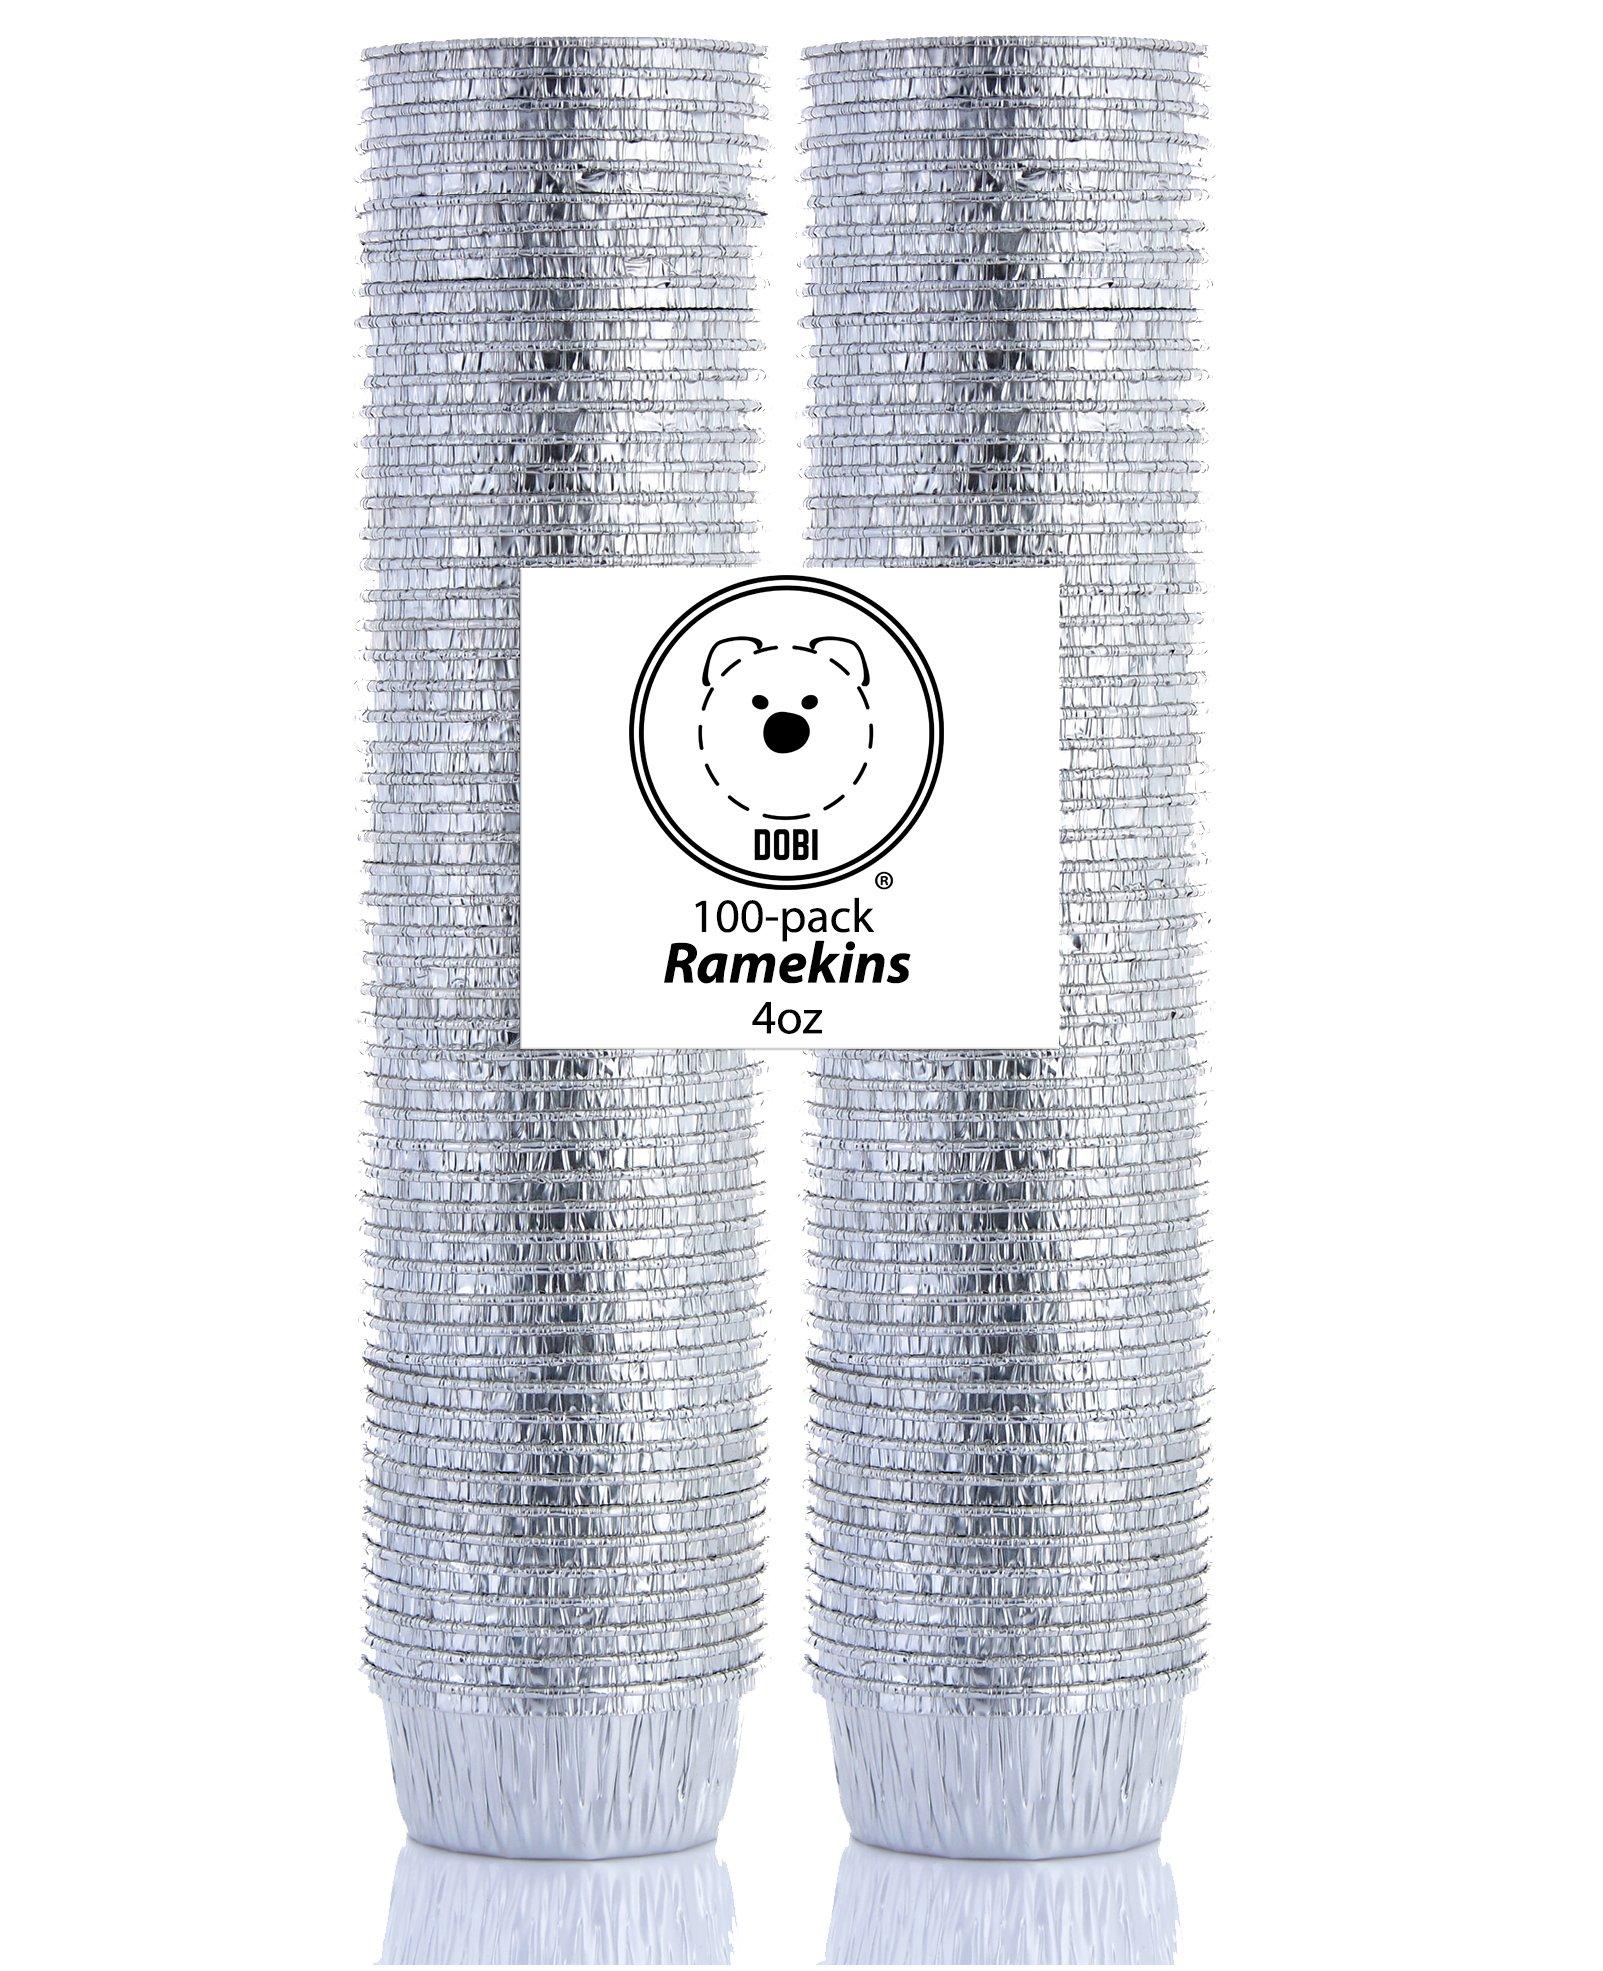 DOBI Ramekins - Disposable Aluminum Foil Ramekins, Standard Size - 4 oz. (Pack of 100)